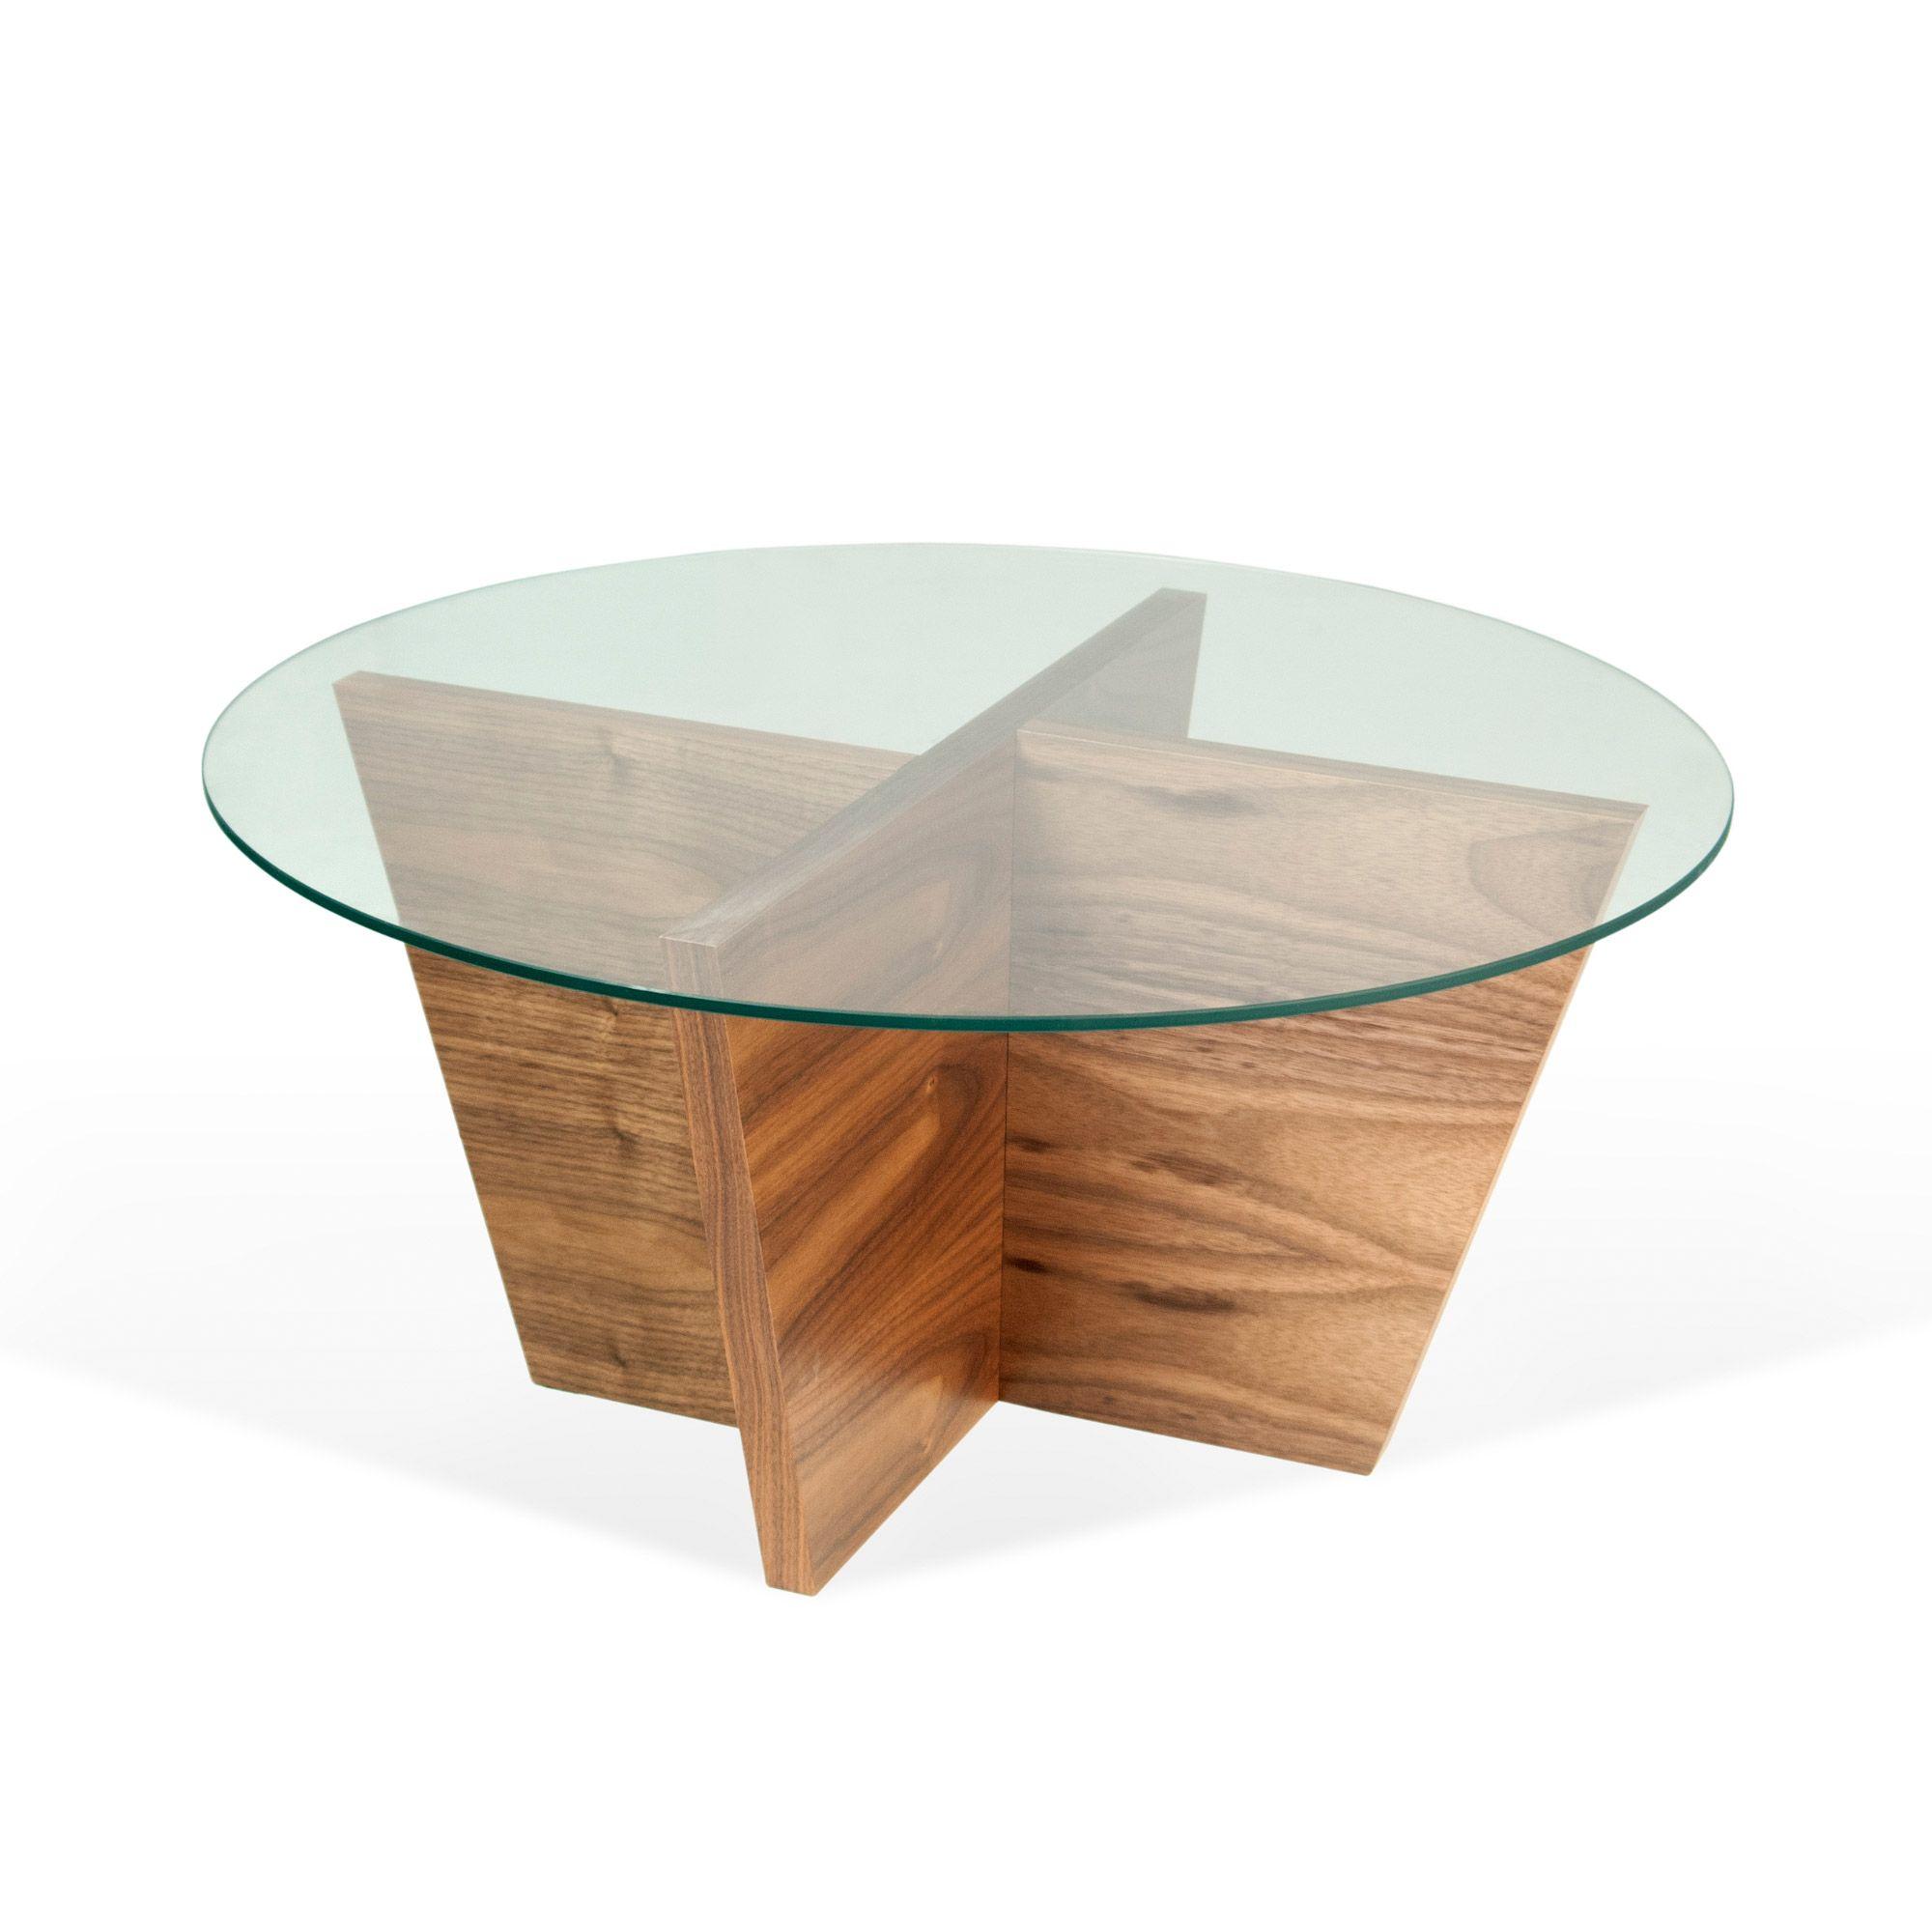 plateau en verre rond free perfect table basse ronde verre et bois with plateau verre rond with. Black Bedroom Furniture Sets. Home Design Ideas